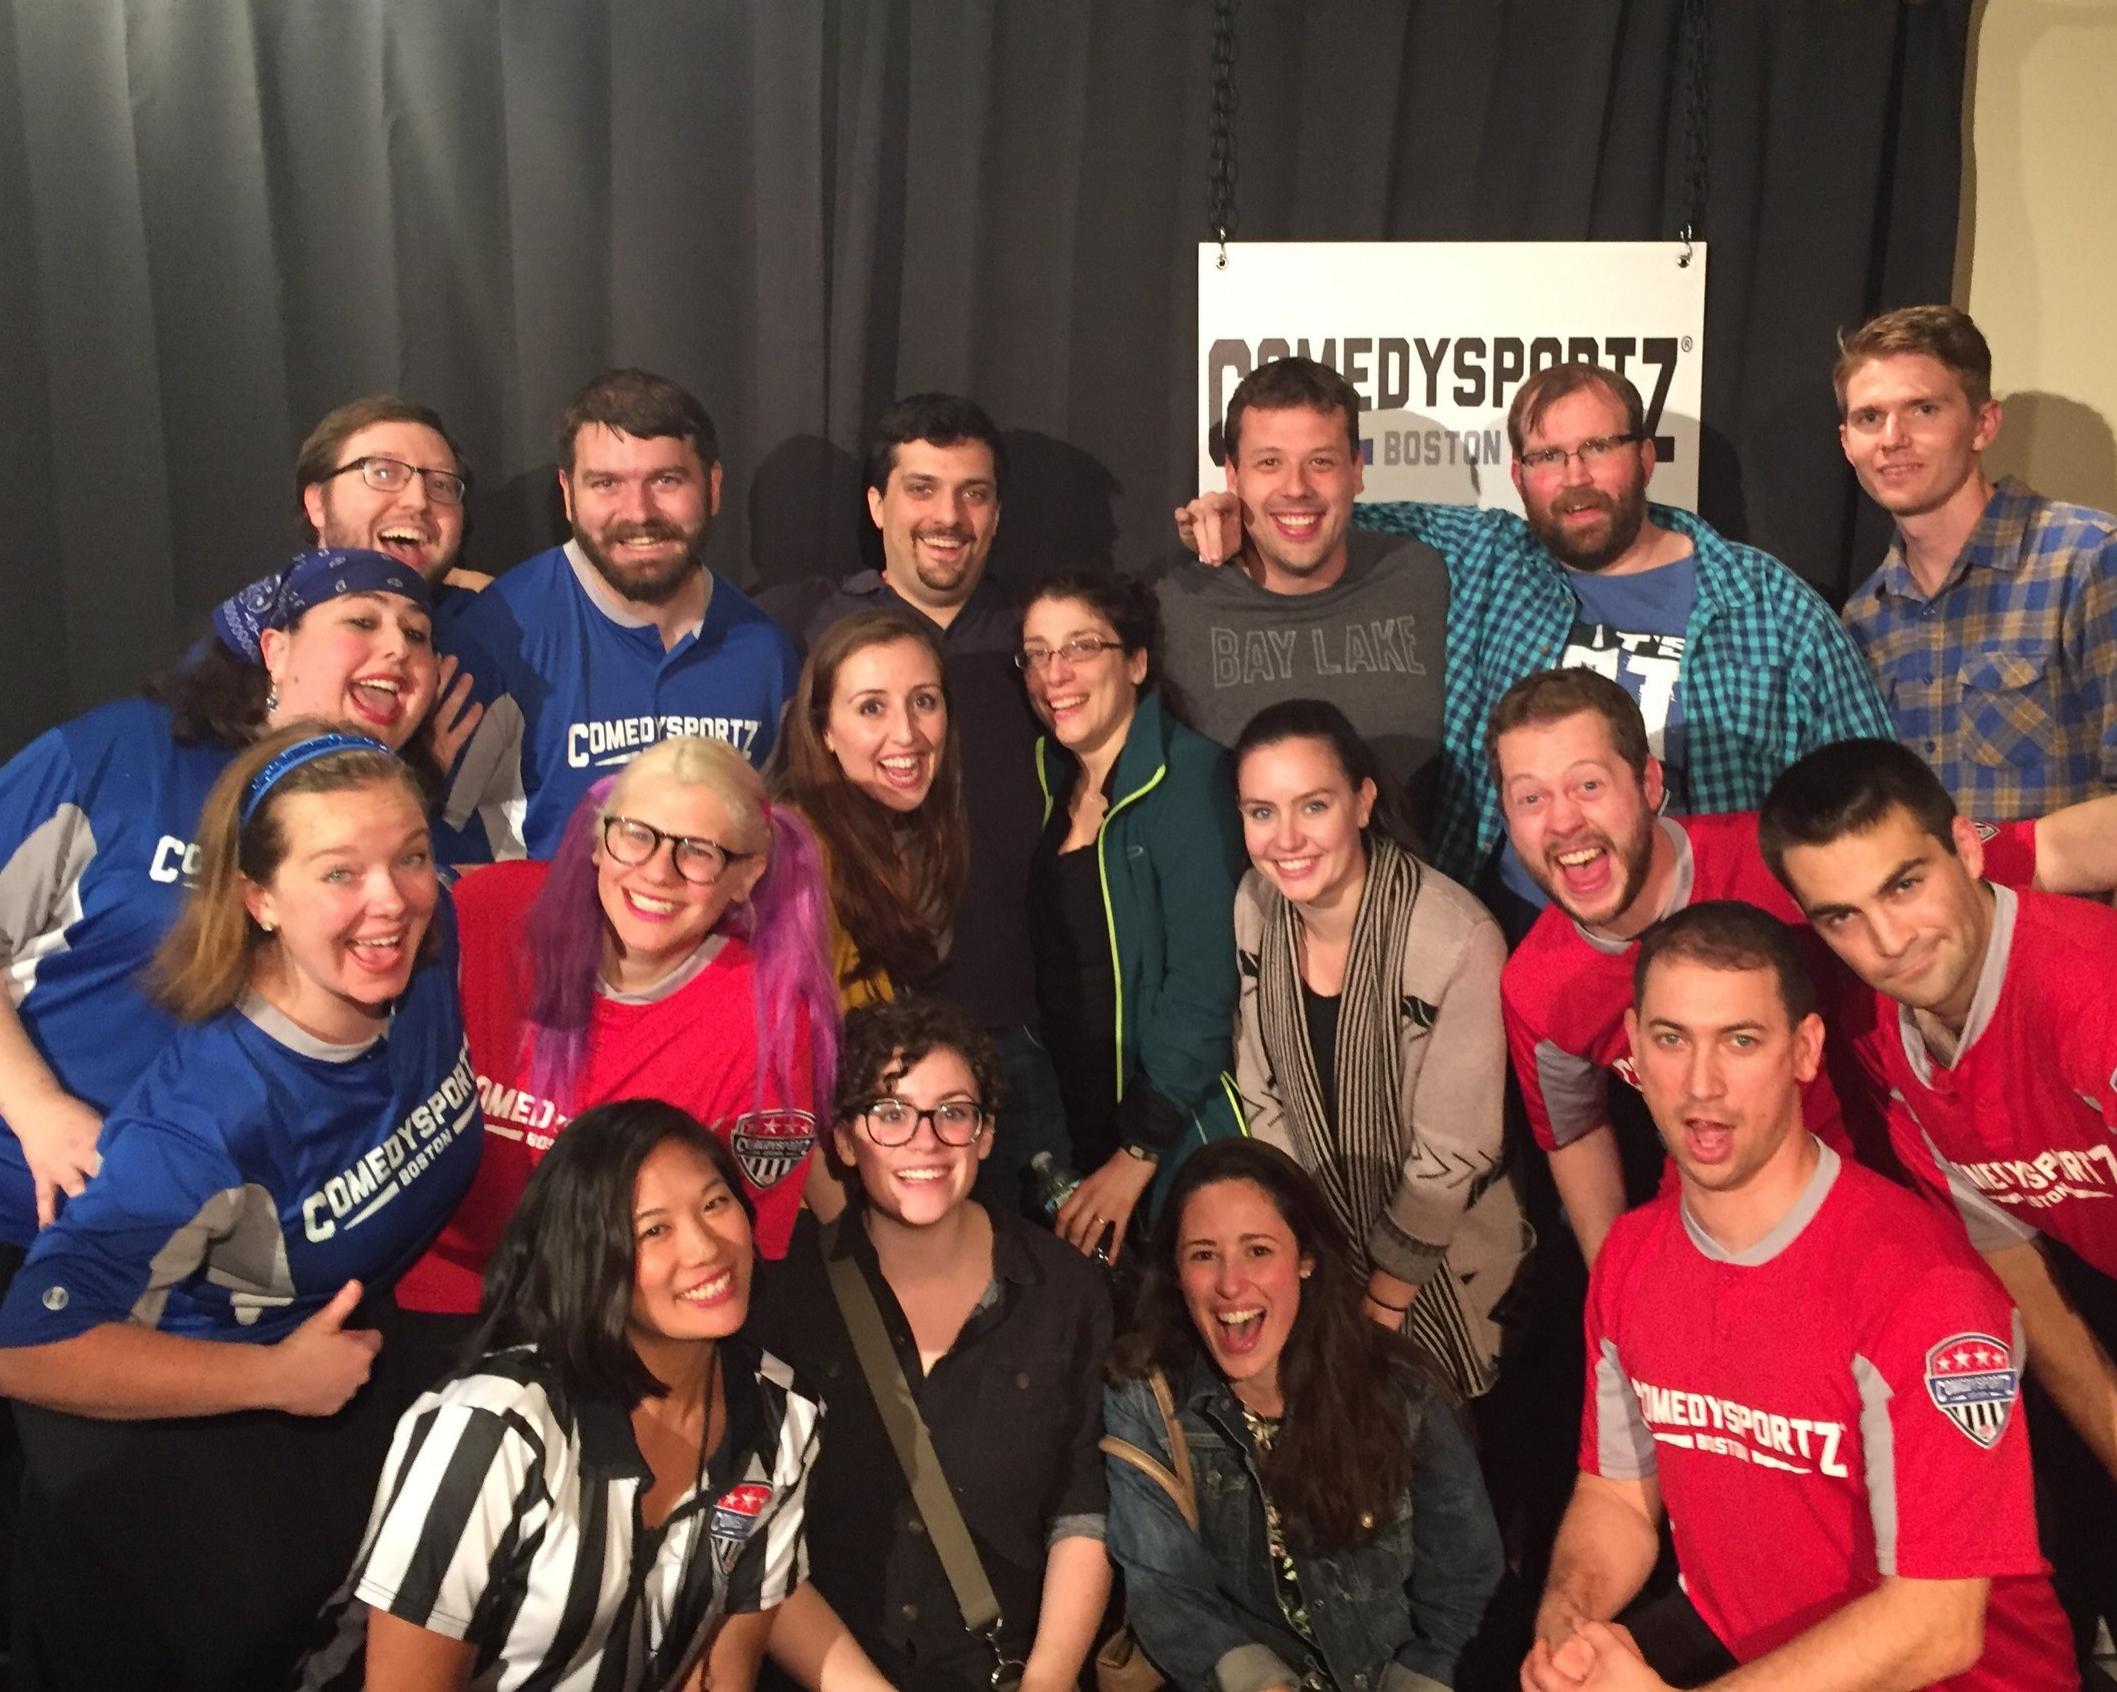 Bachelor & Bachelorette celebration at ComedySportz!